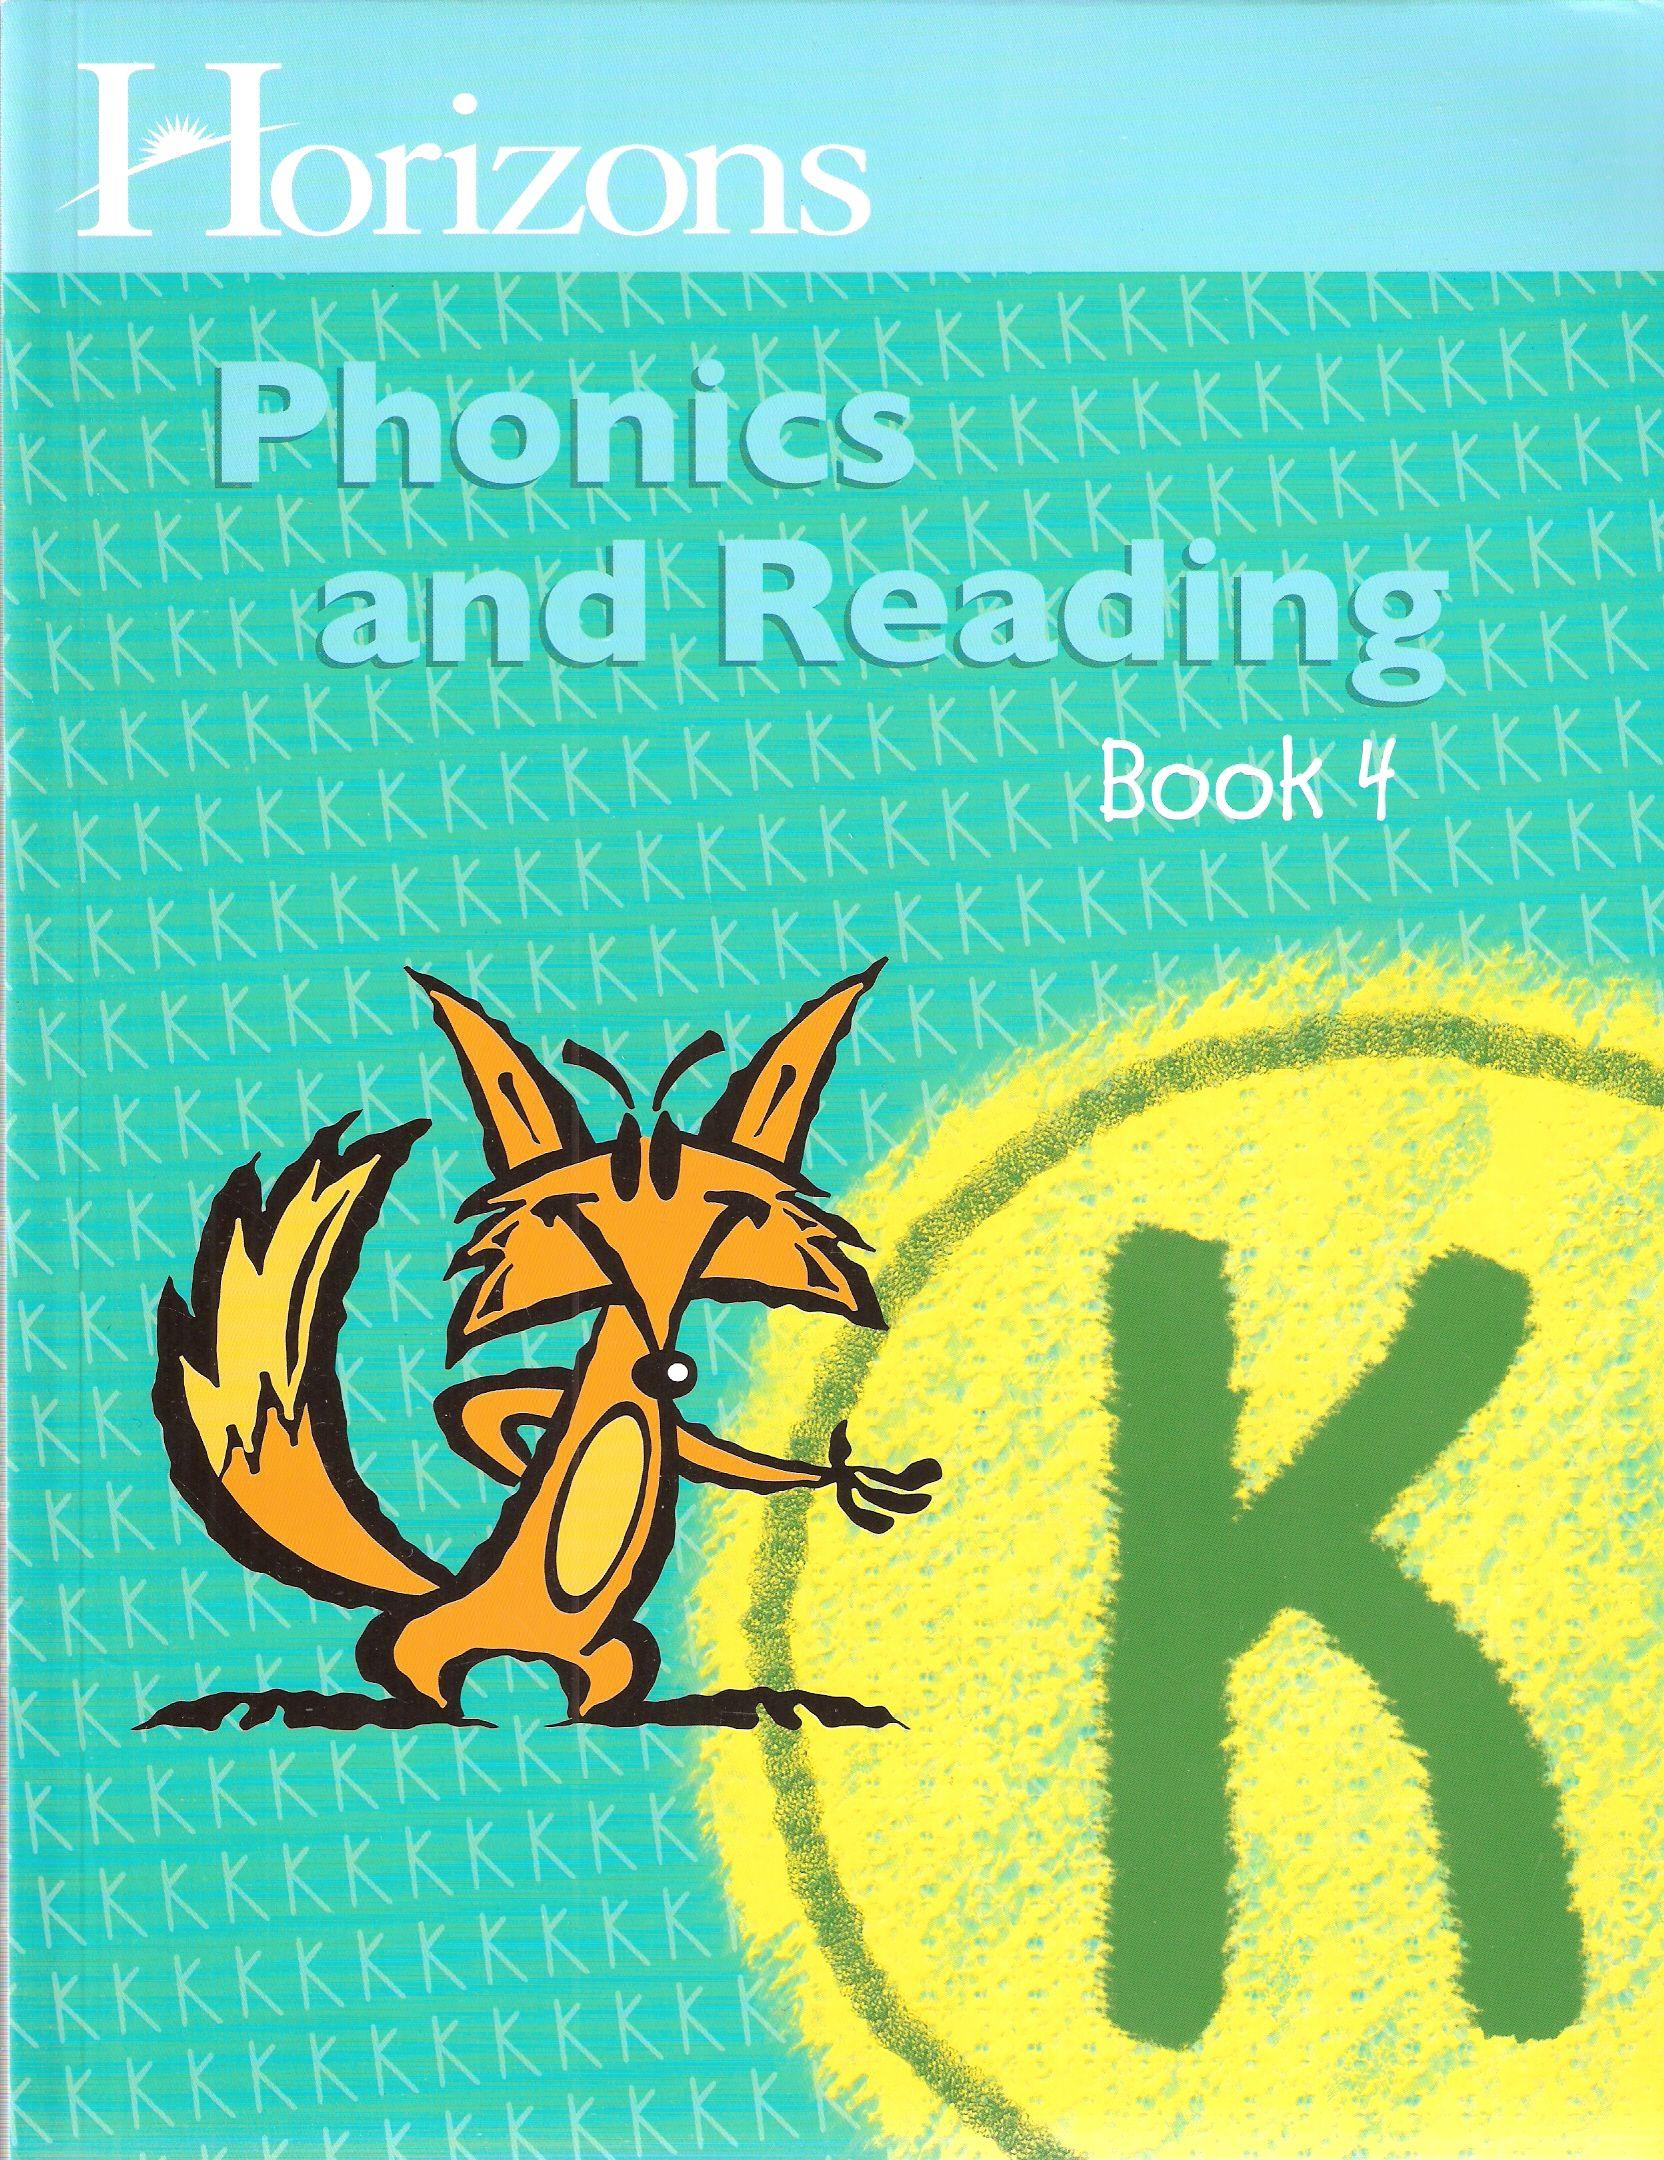 Horizons Phonics Reading Wkbk 4 Second Harvest Curriculum Phonics Reading Phonics Phonics Kindergarten Reading horizons student workbook pdf